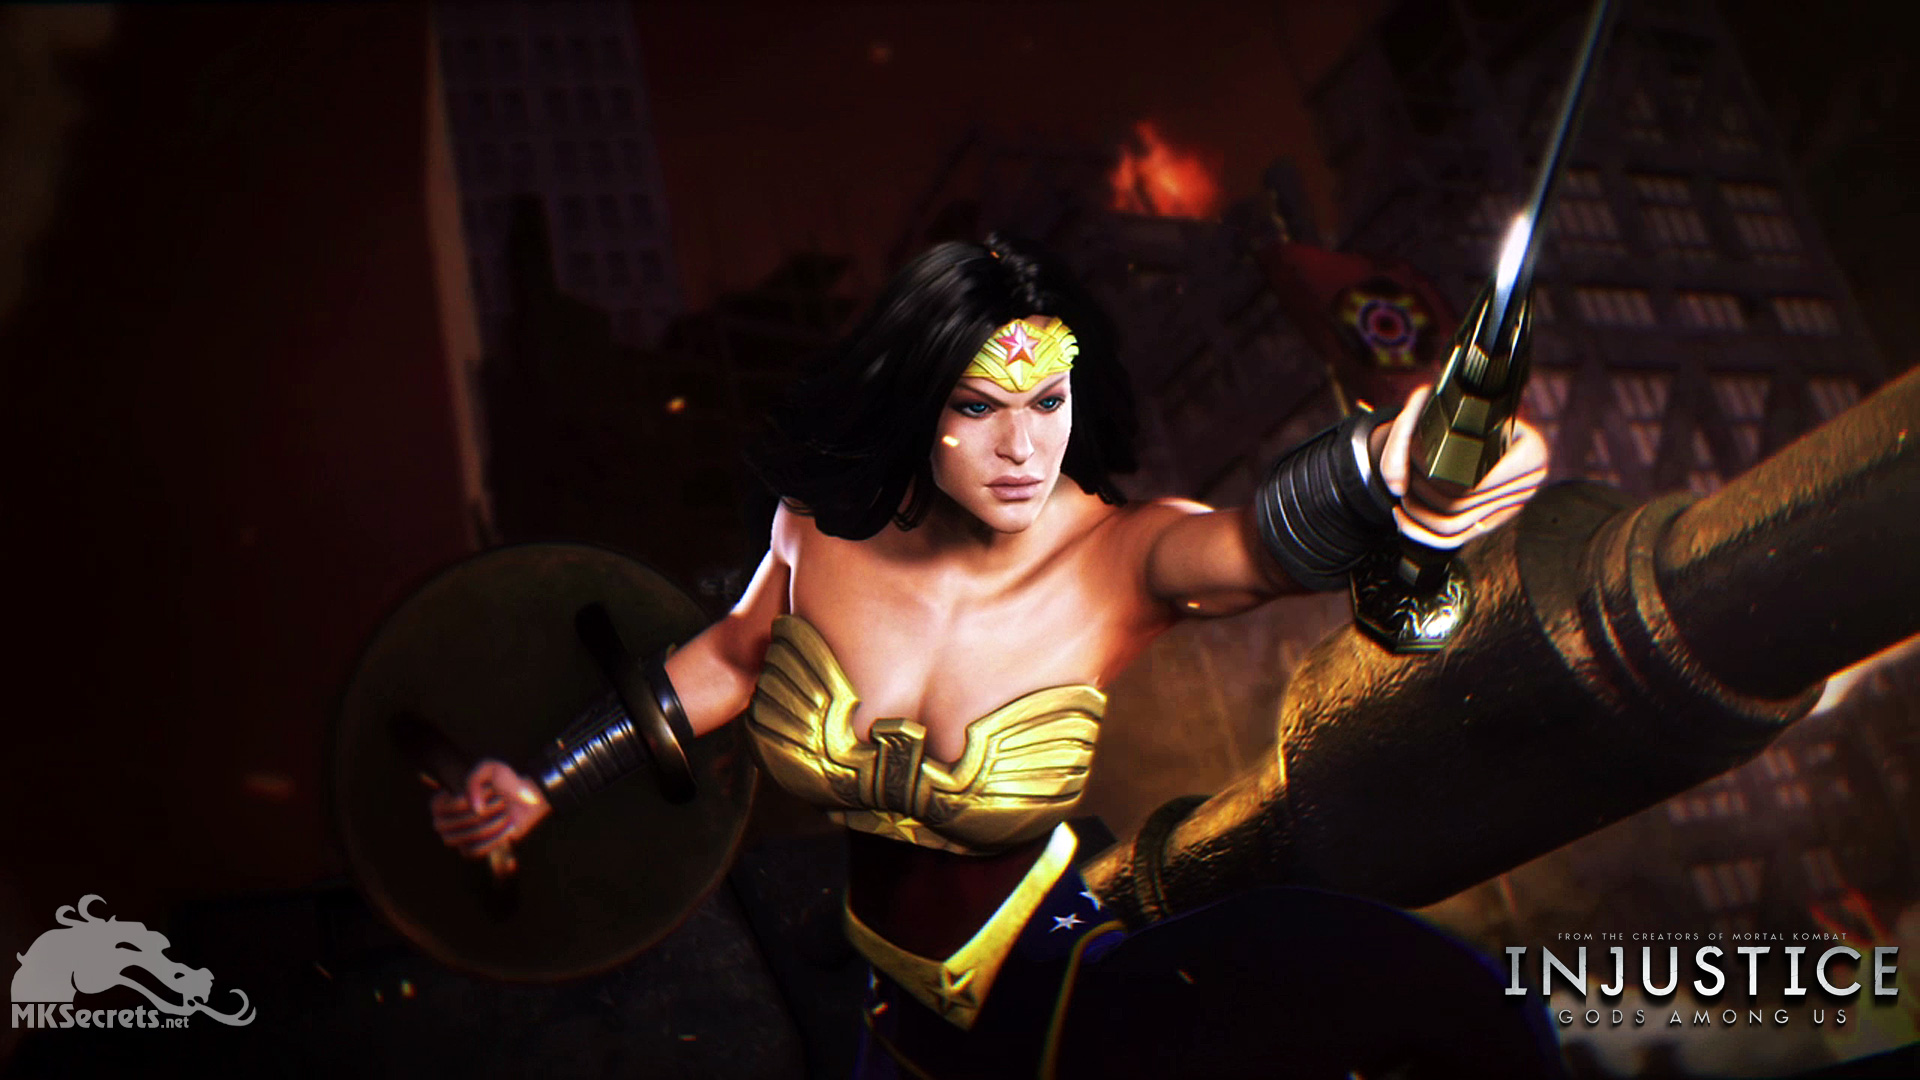 Injustice Gods Among Us Wallpapers Mortal Kombat Secrets